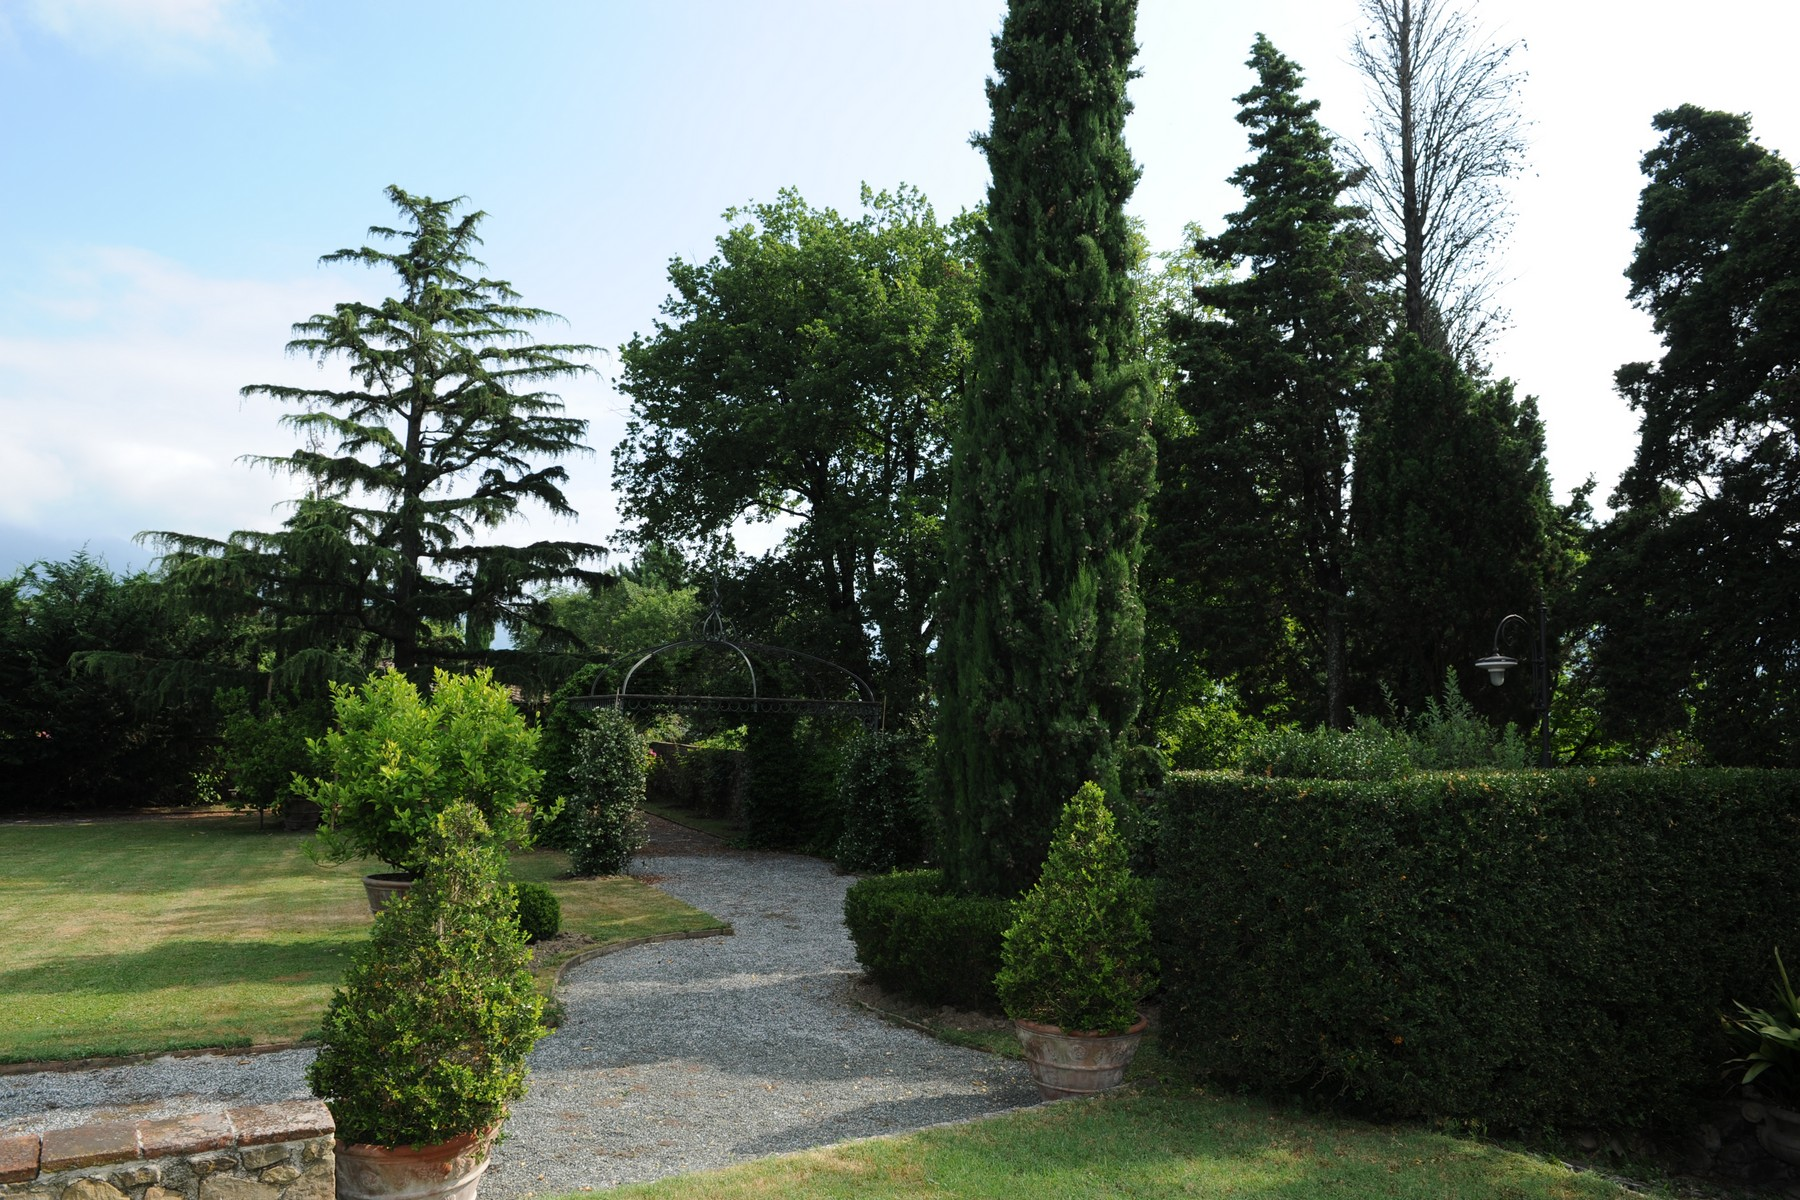 Villa in Vendita a Camaiore: 5 locali, 900 mq - Foto 14